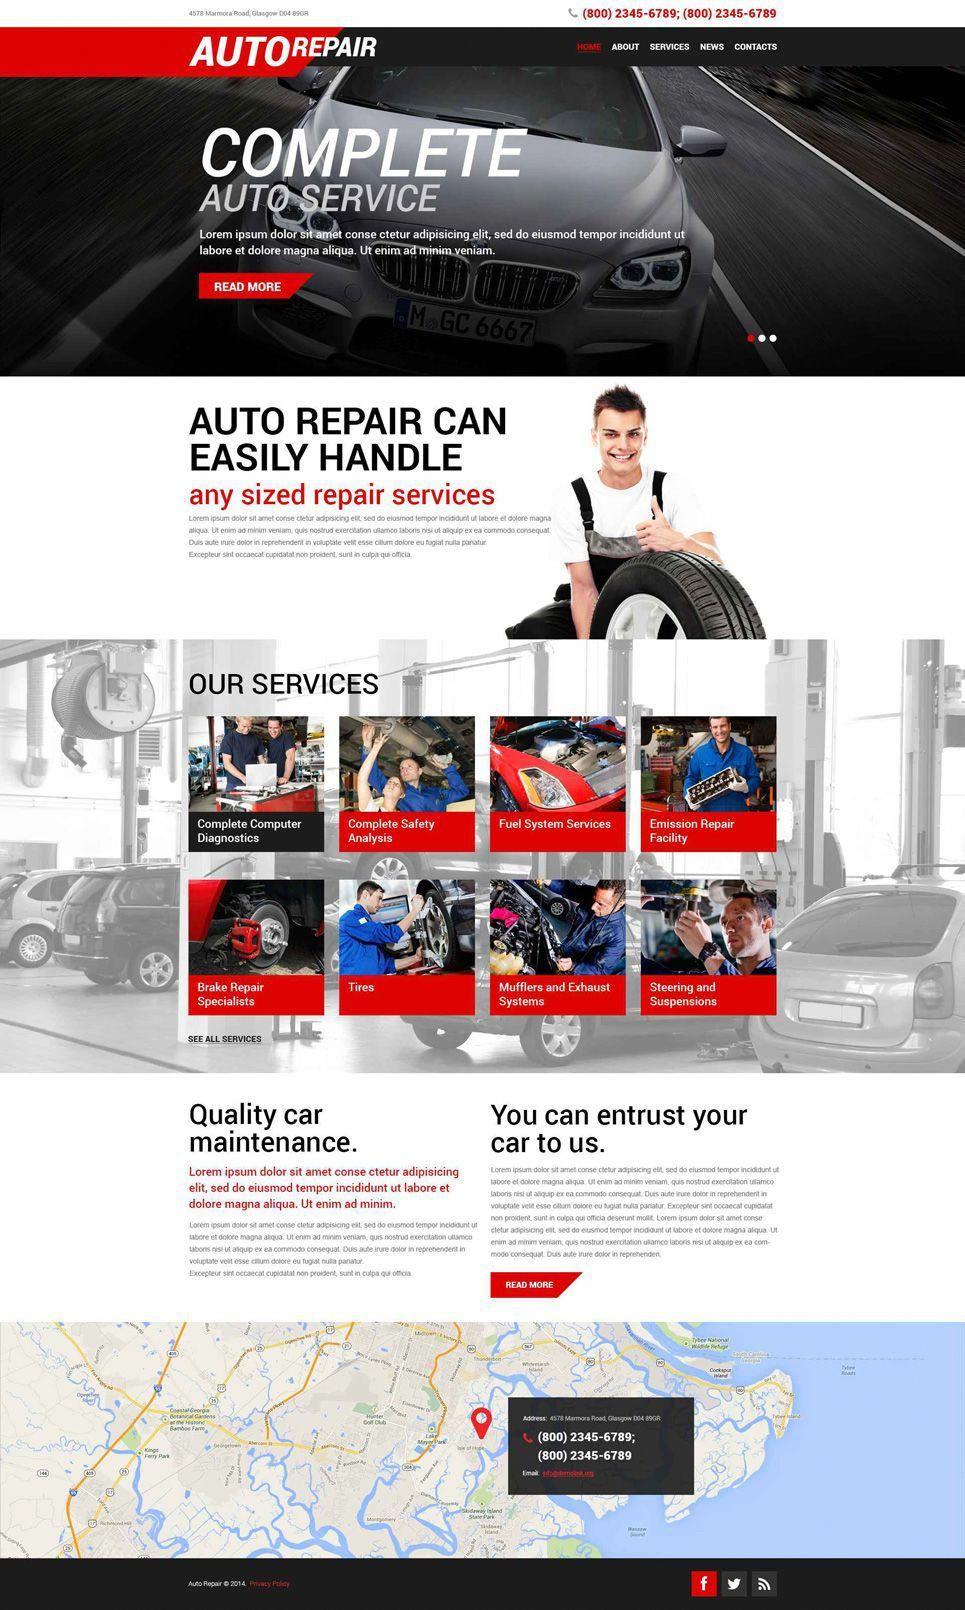 Auto Repair Service Wordpress Theme Repair Auto Service Car Repair Service Auto Repair Repair